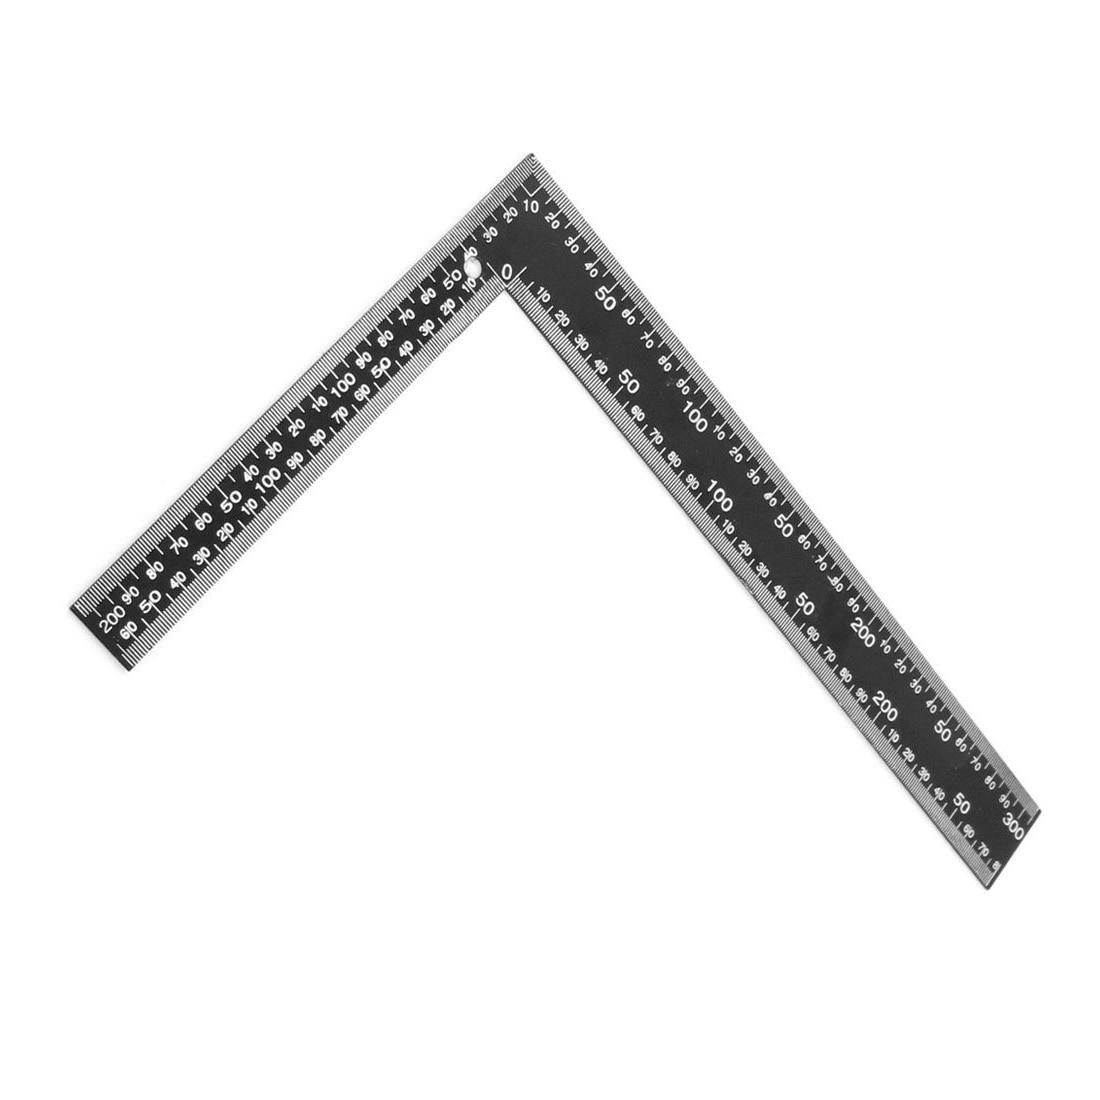 Teacher 0-30cm 0-20cm Measuring Range L Shaped Design Square Ruler Black